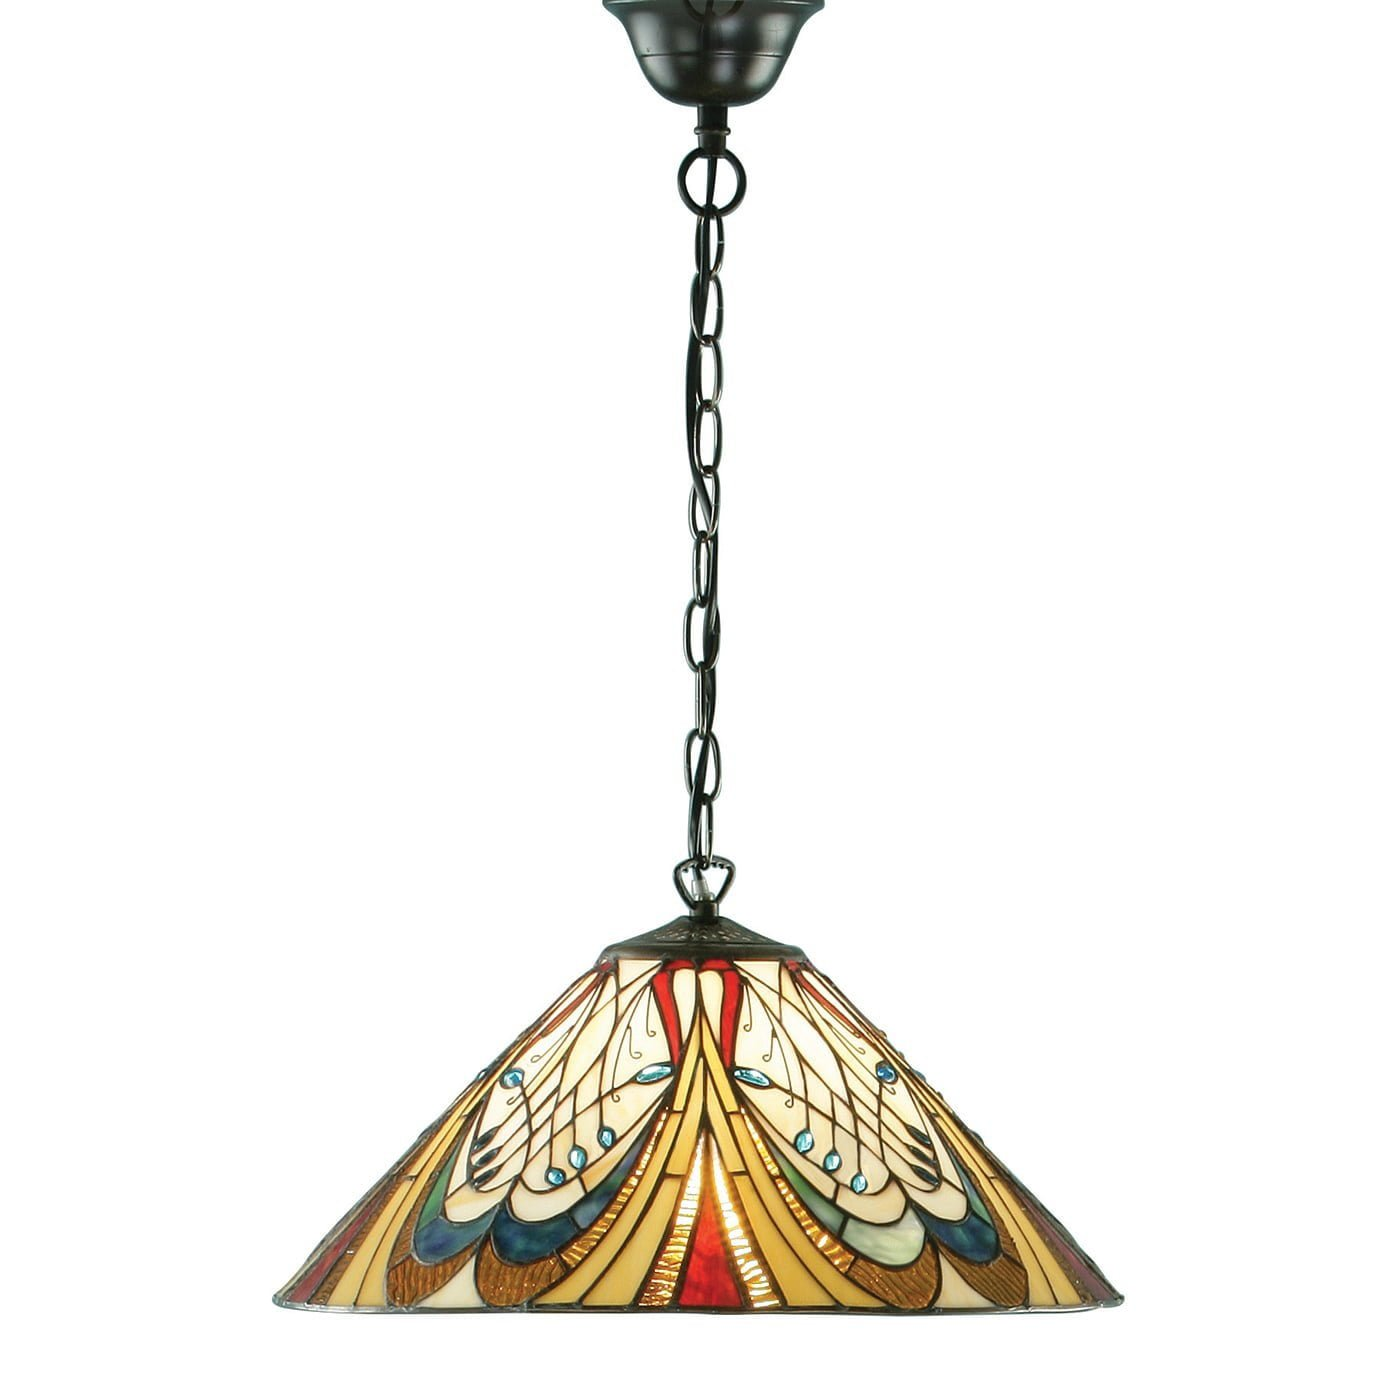 Interiors 1900 64162 Hector Medium 1lt pendant, Tiffany